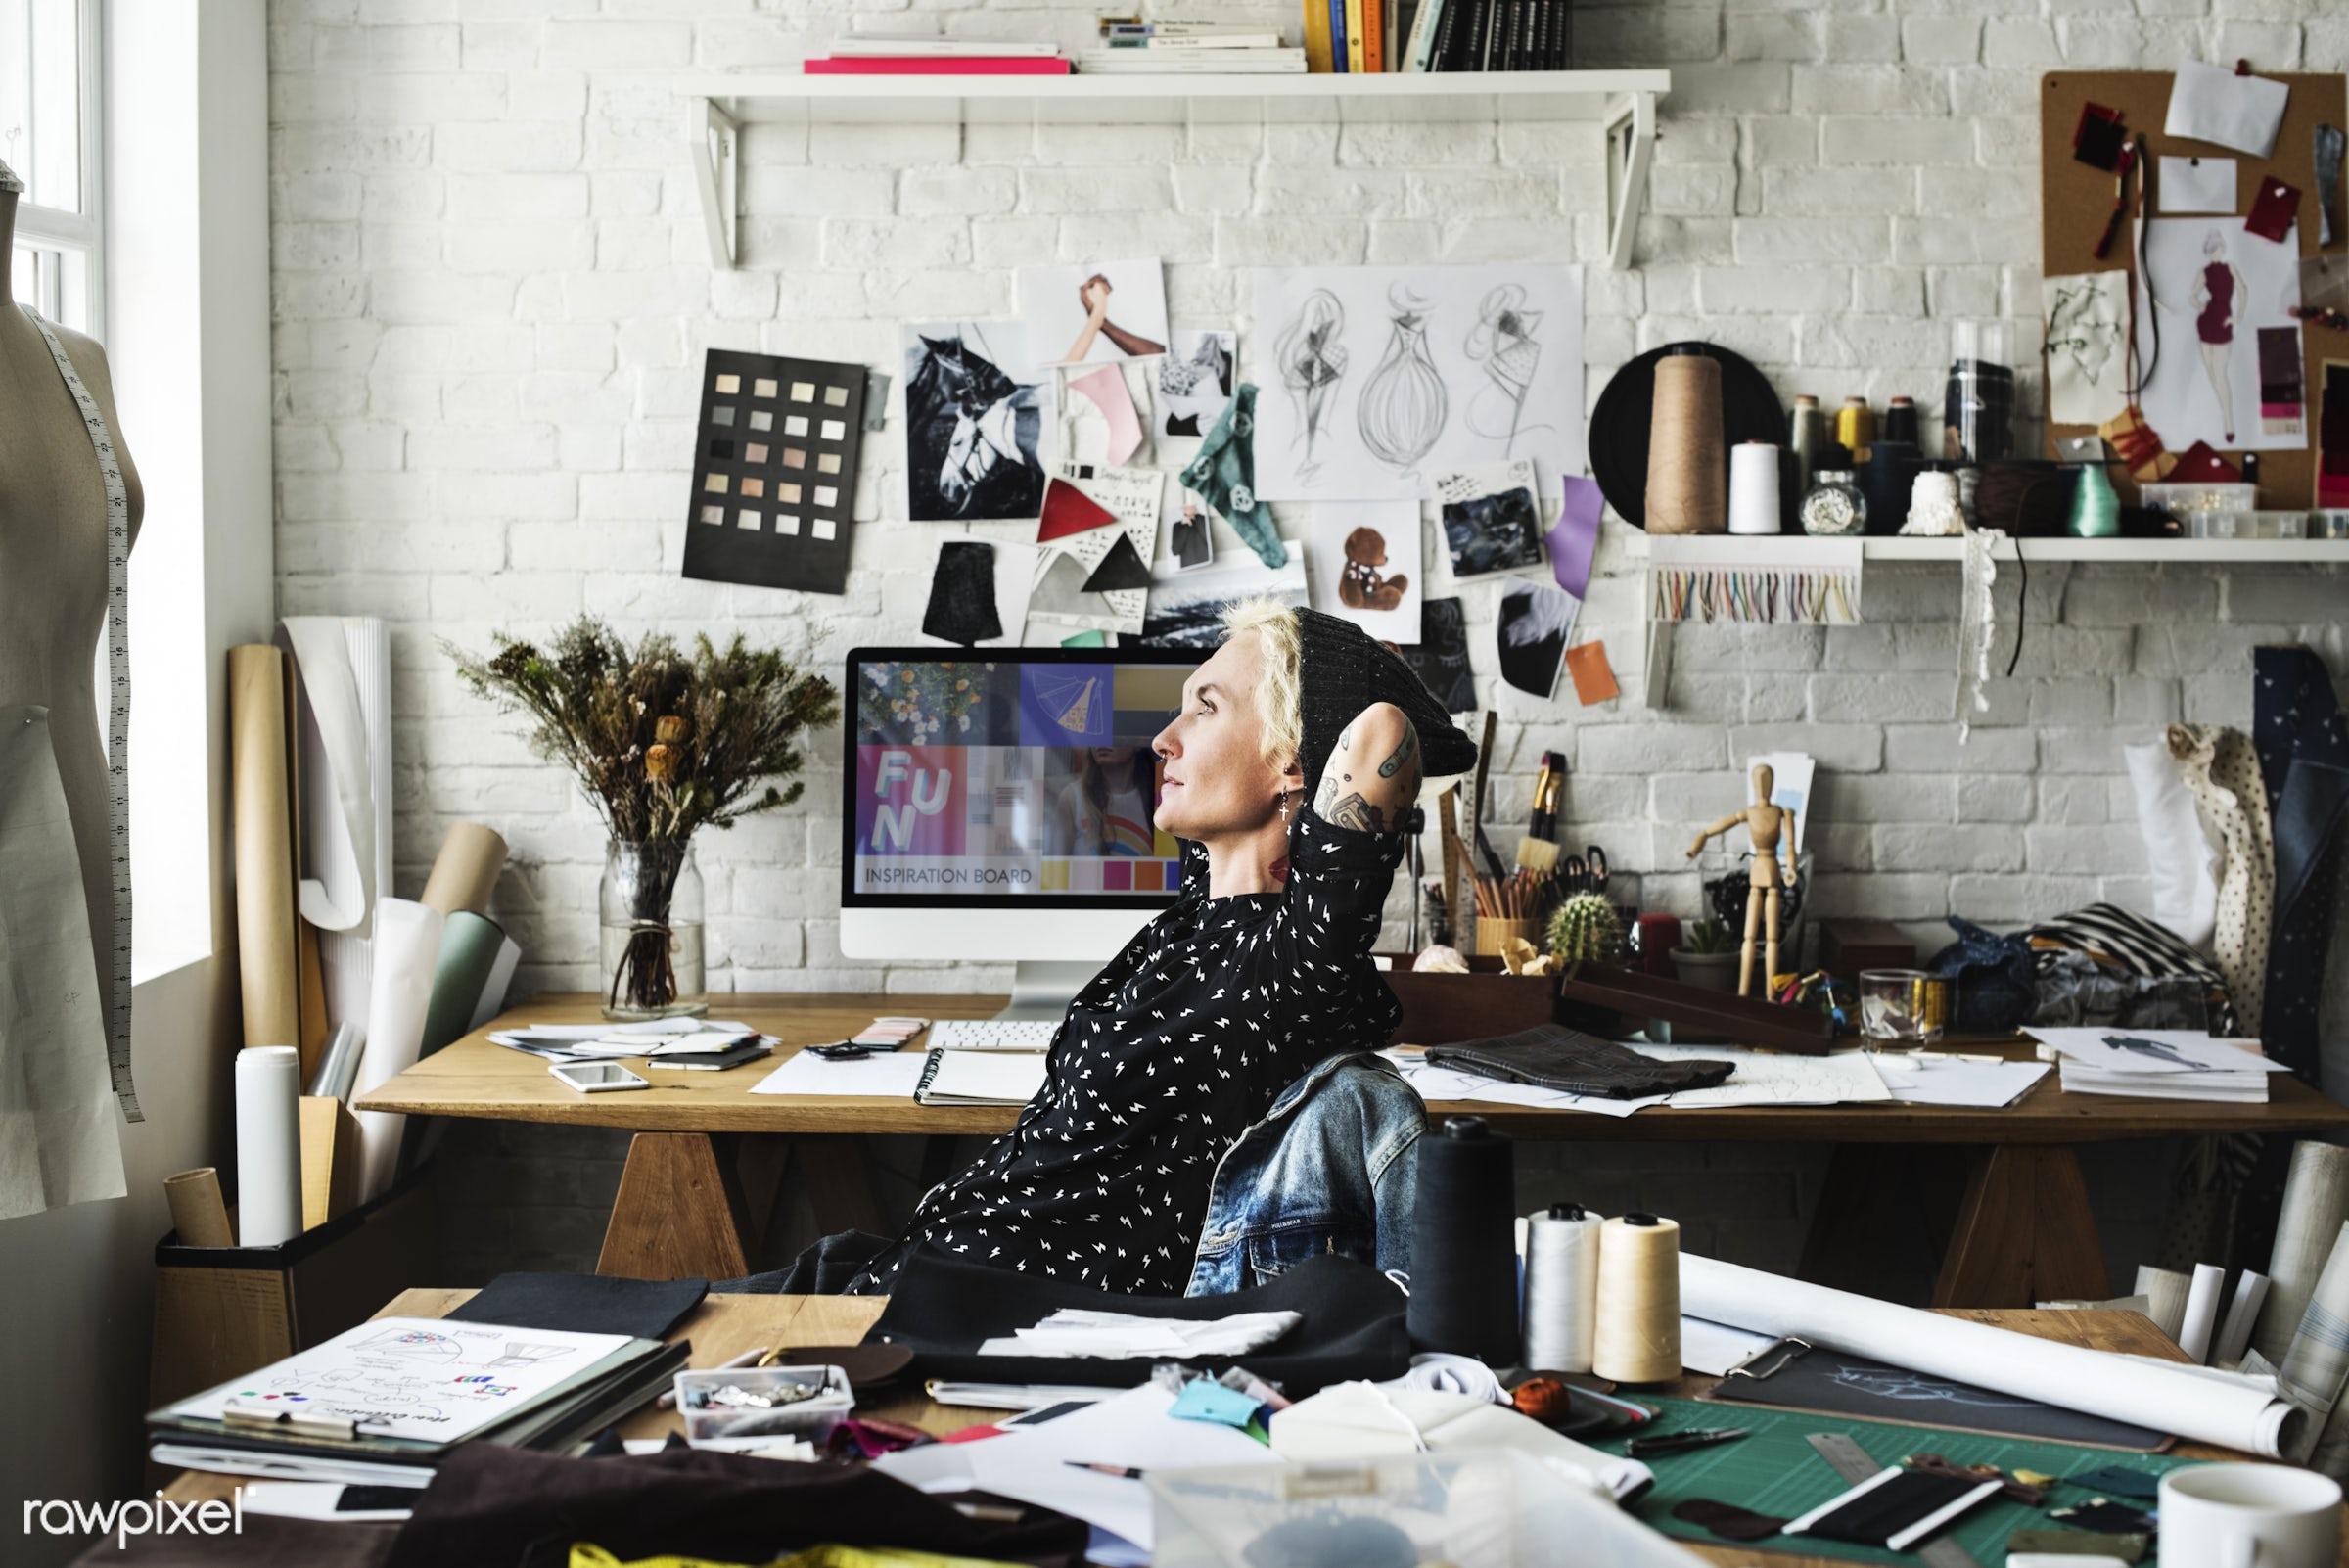 studio, craft, fashion, measure, clothing, handicraft, dressmaker, trendy, stylist, creativity, inspiration, style, cloth,...